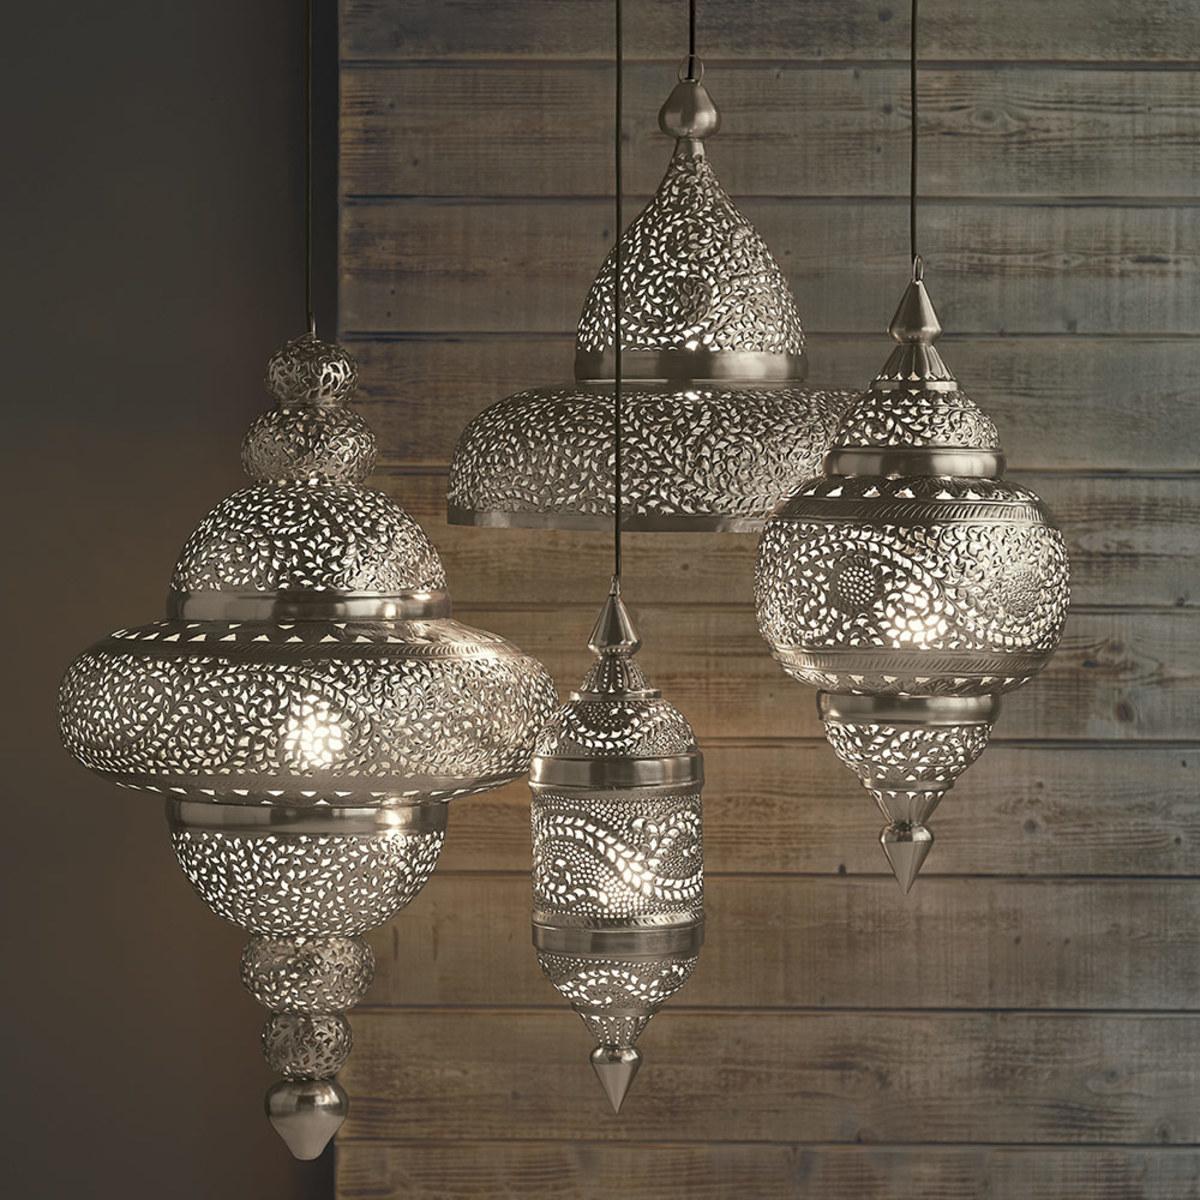 Moroccan bedroom Decor lamps